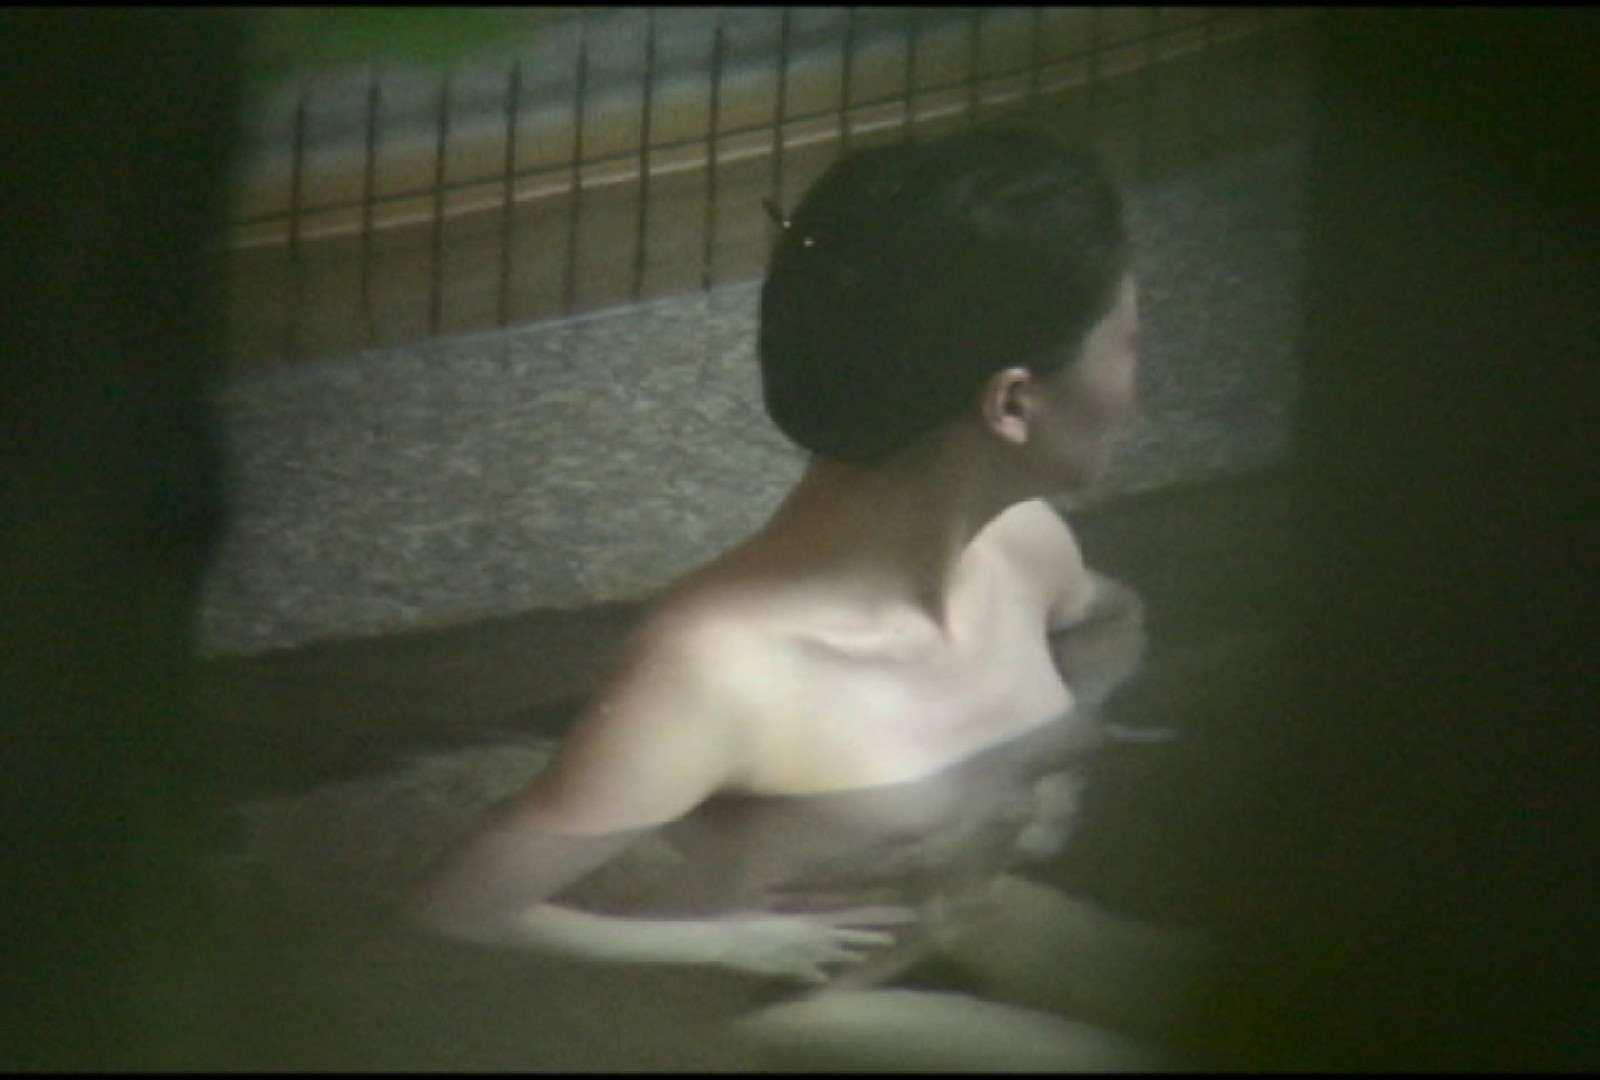 Aquaな露天風呂Vol.699 OL女体 えろ無修正画像 60連発 17